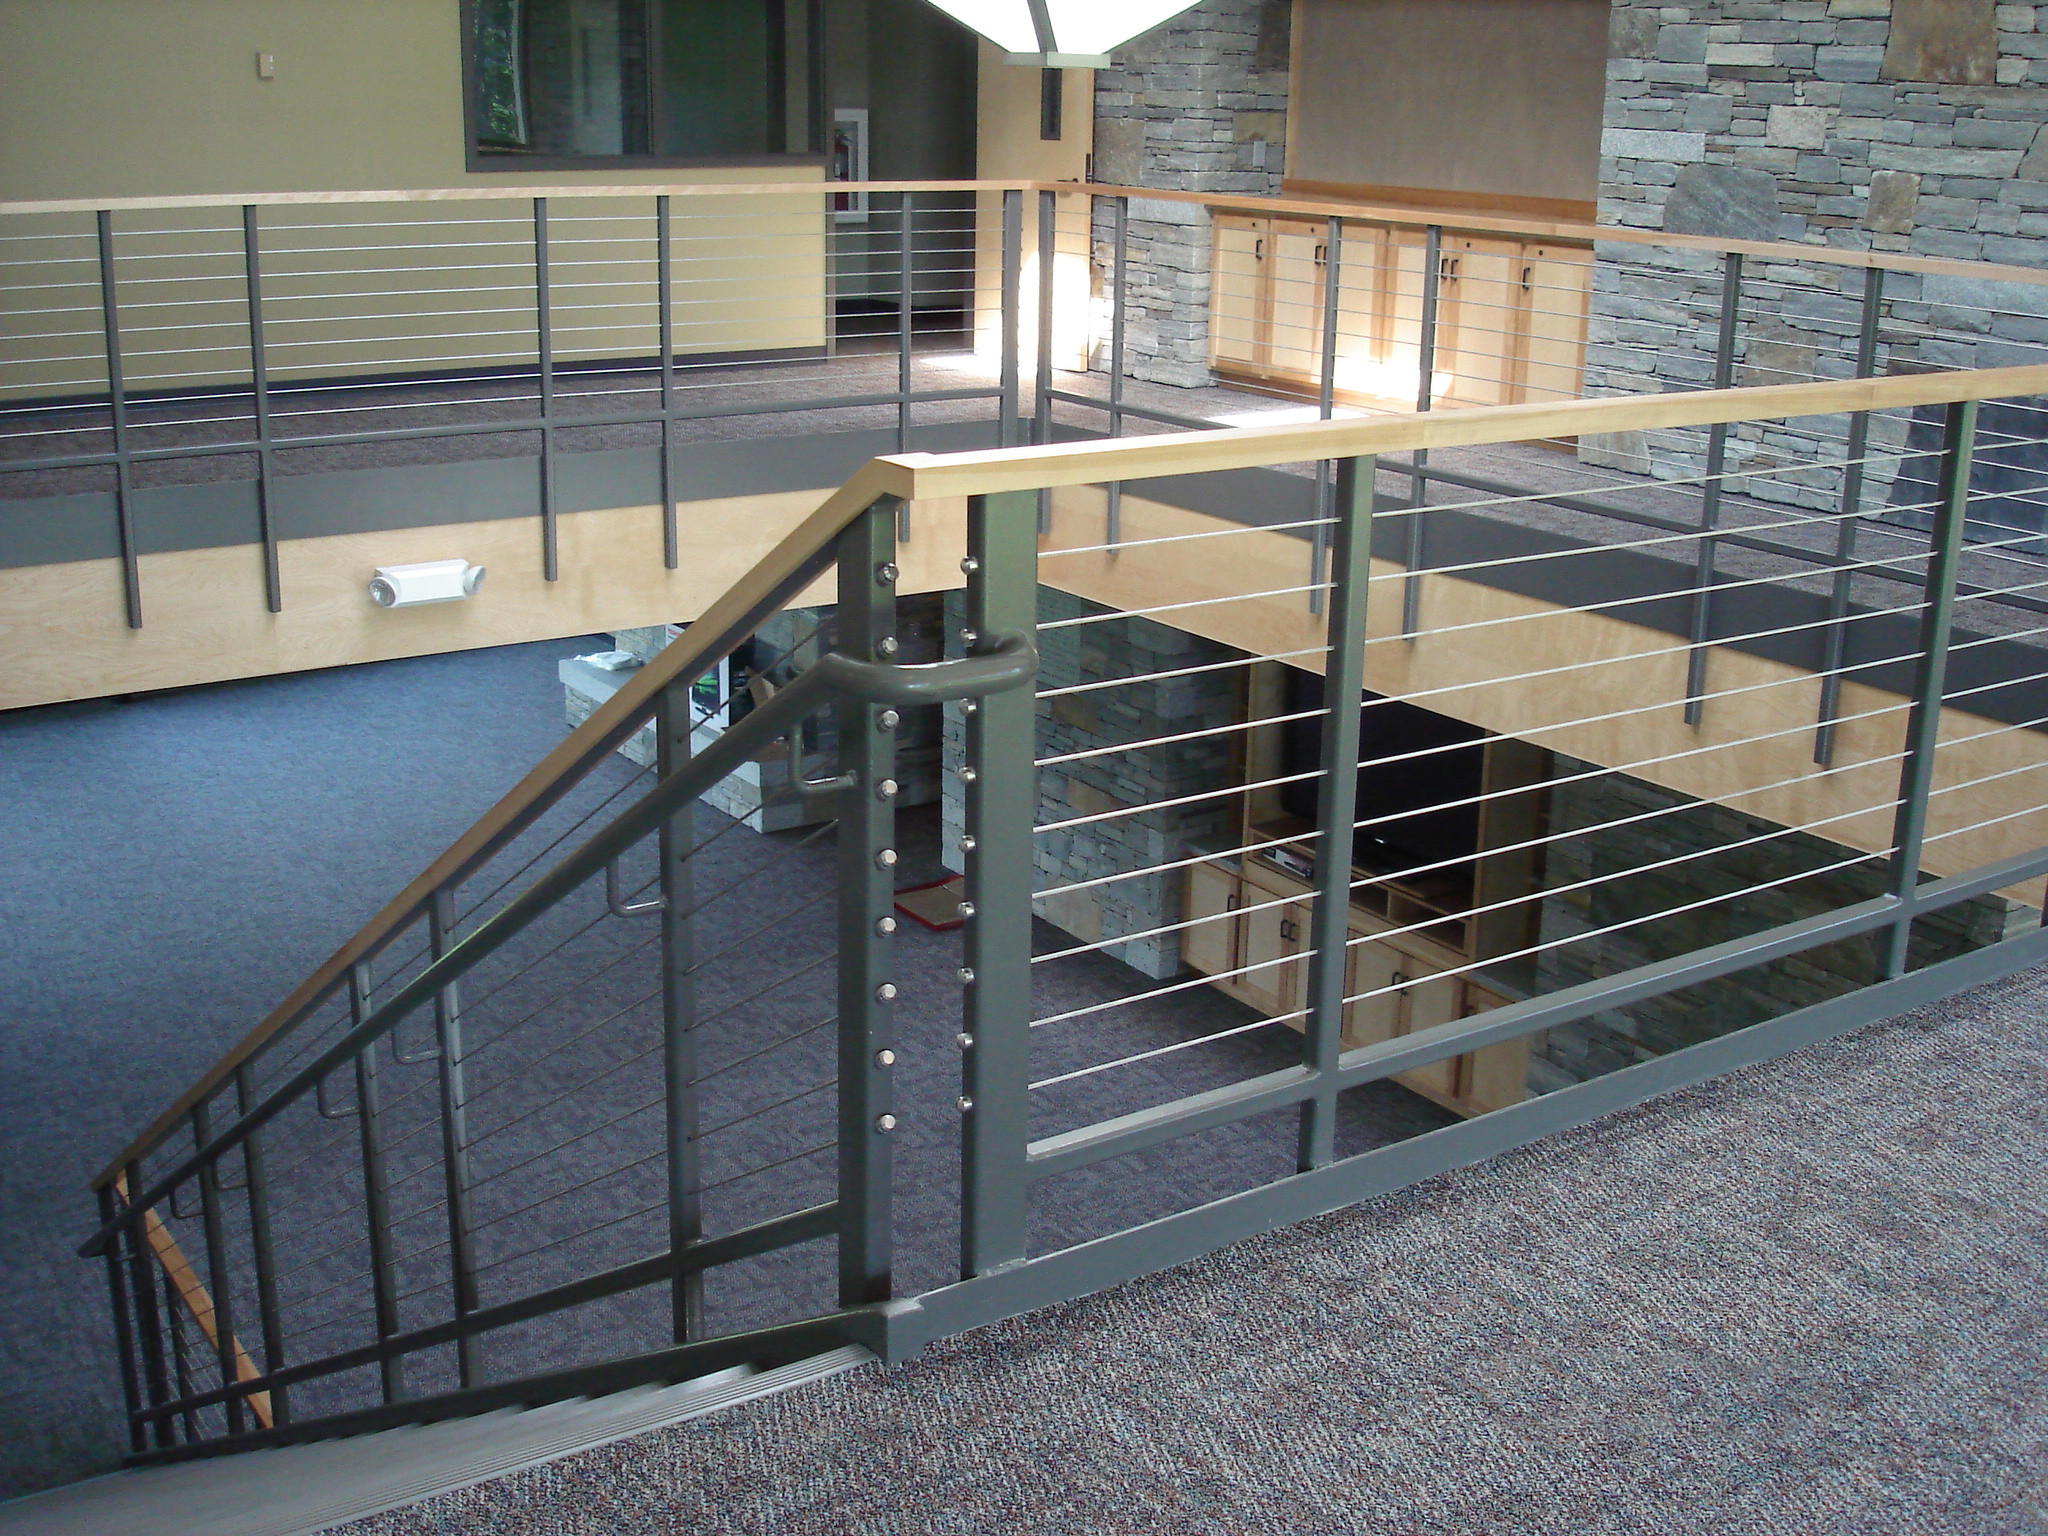 Metal railing on stairs